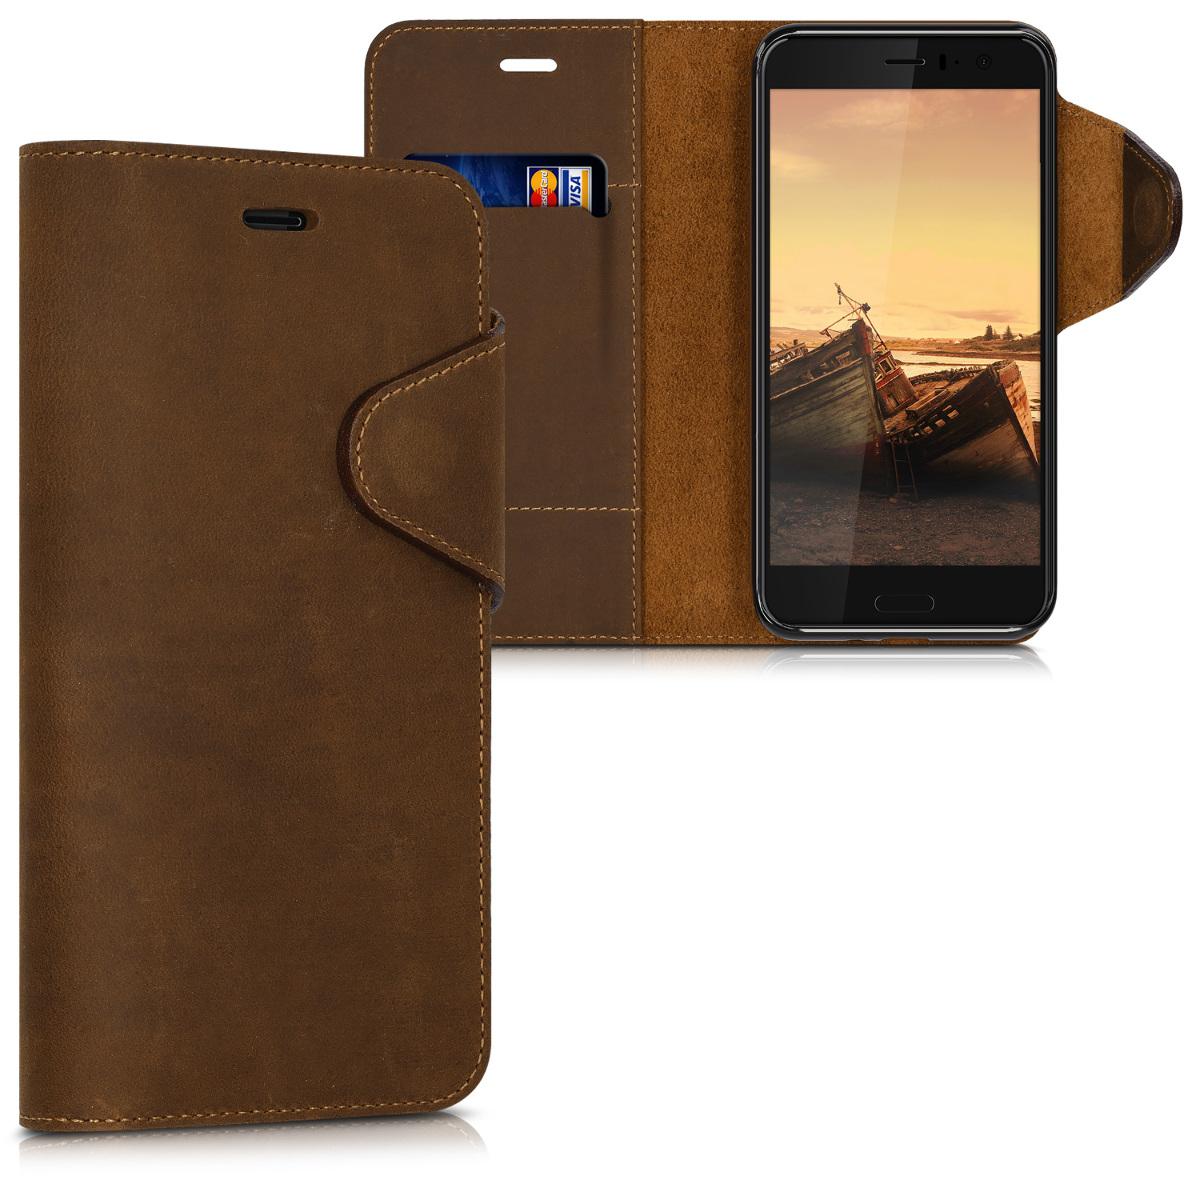 Kalibri Δερμάτινη Suede Θήκη - Πορτοφόλι HTC U11 - Brown (42899.05)